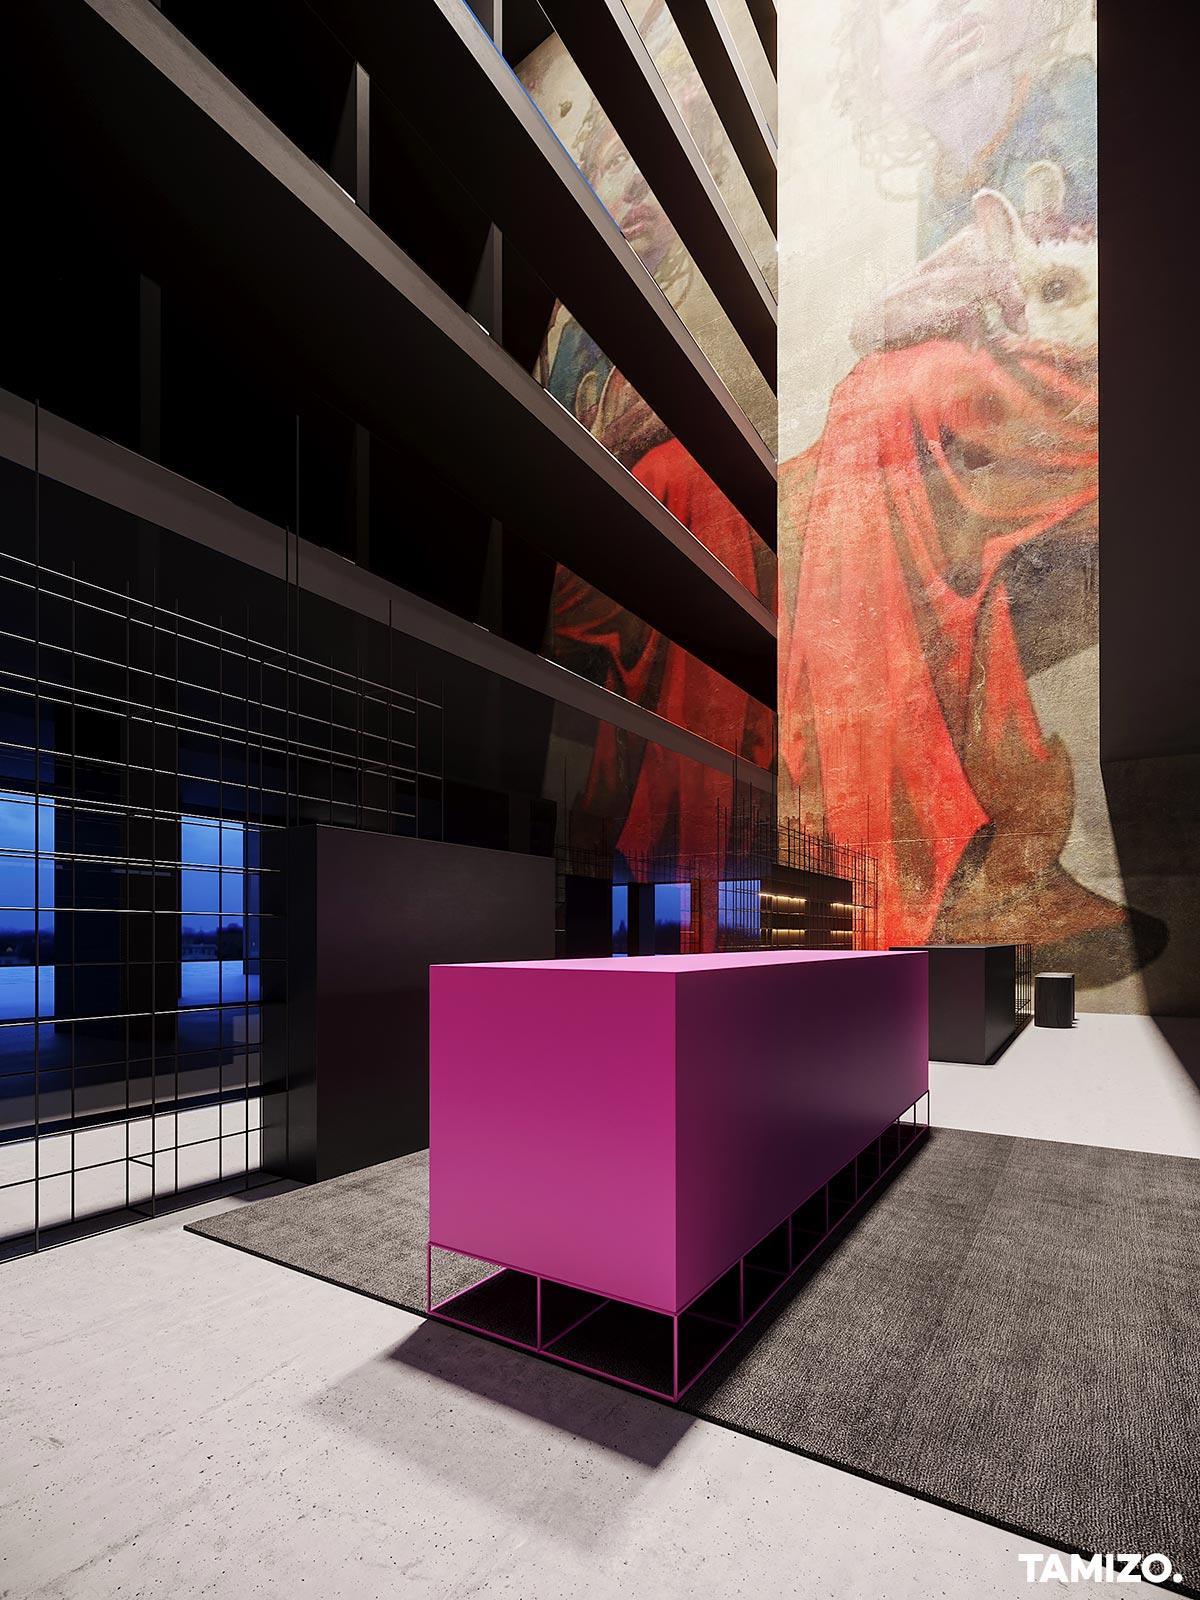 tamizo_architects_hotel_krakow_design_architecture_project_04